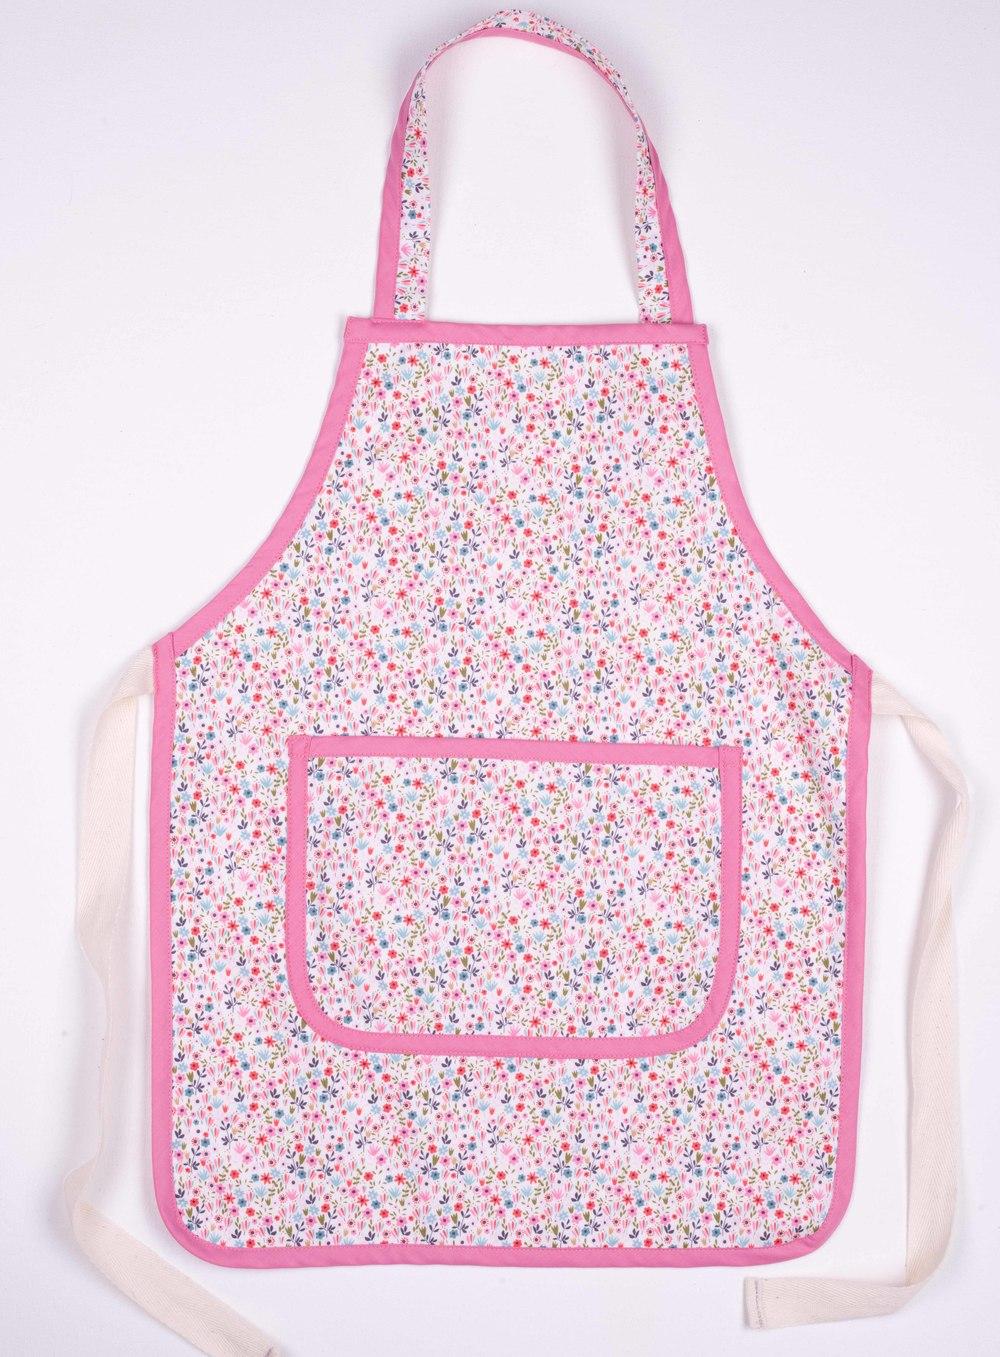 Skoo KidsKitchen Pink Floral Print Apron